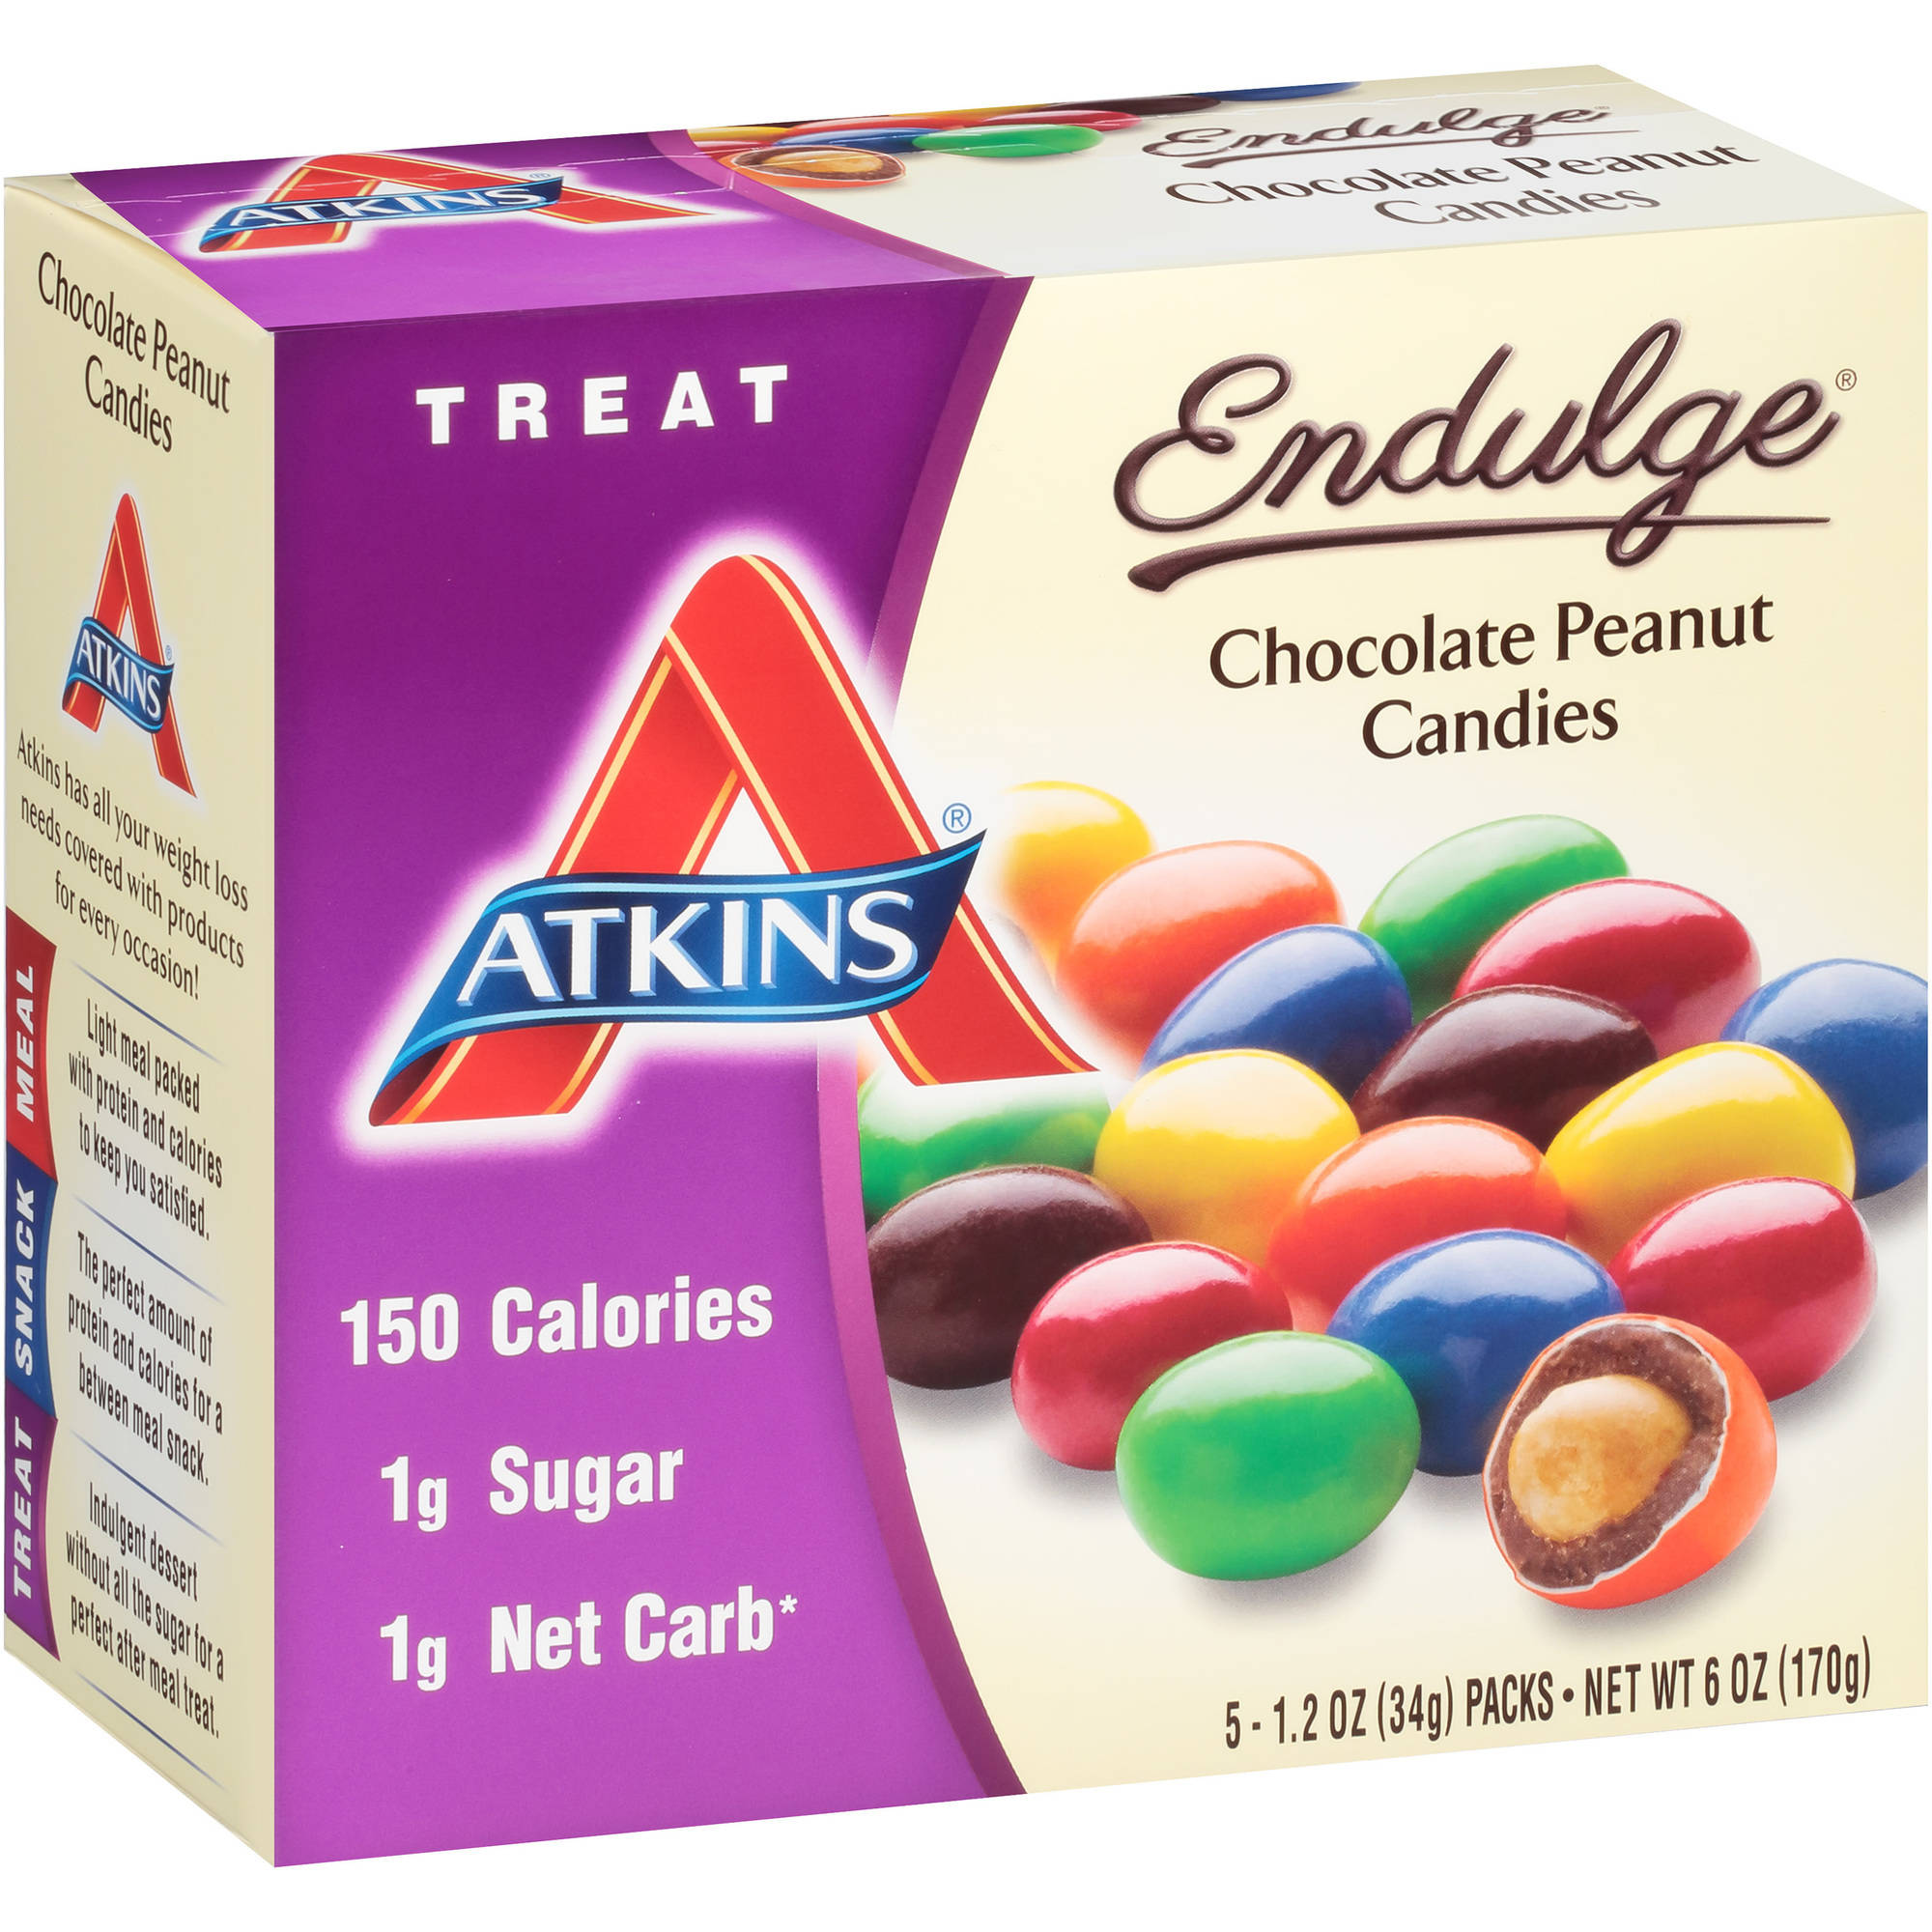 Atkins Endulge Chocolate Peanut Candies, 1.2 oz, 5 count